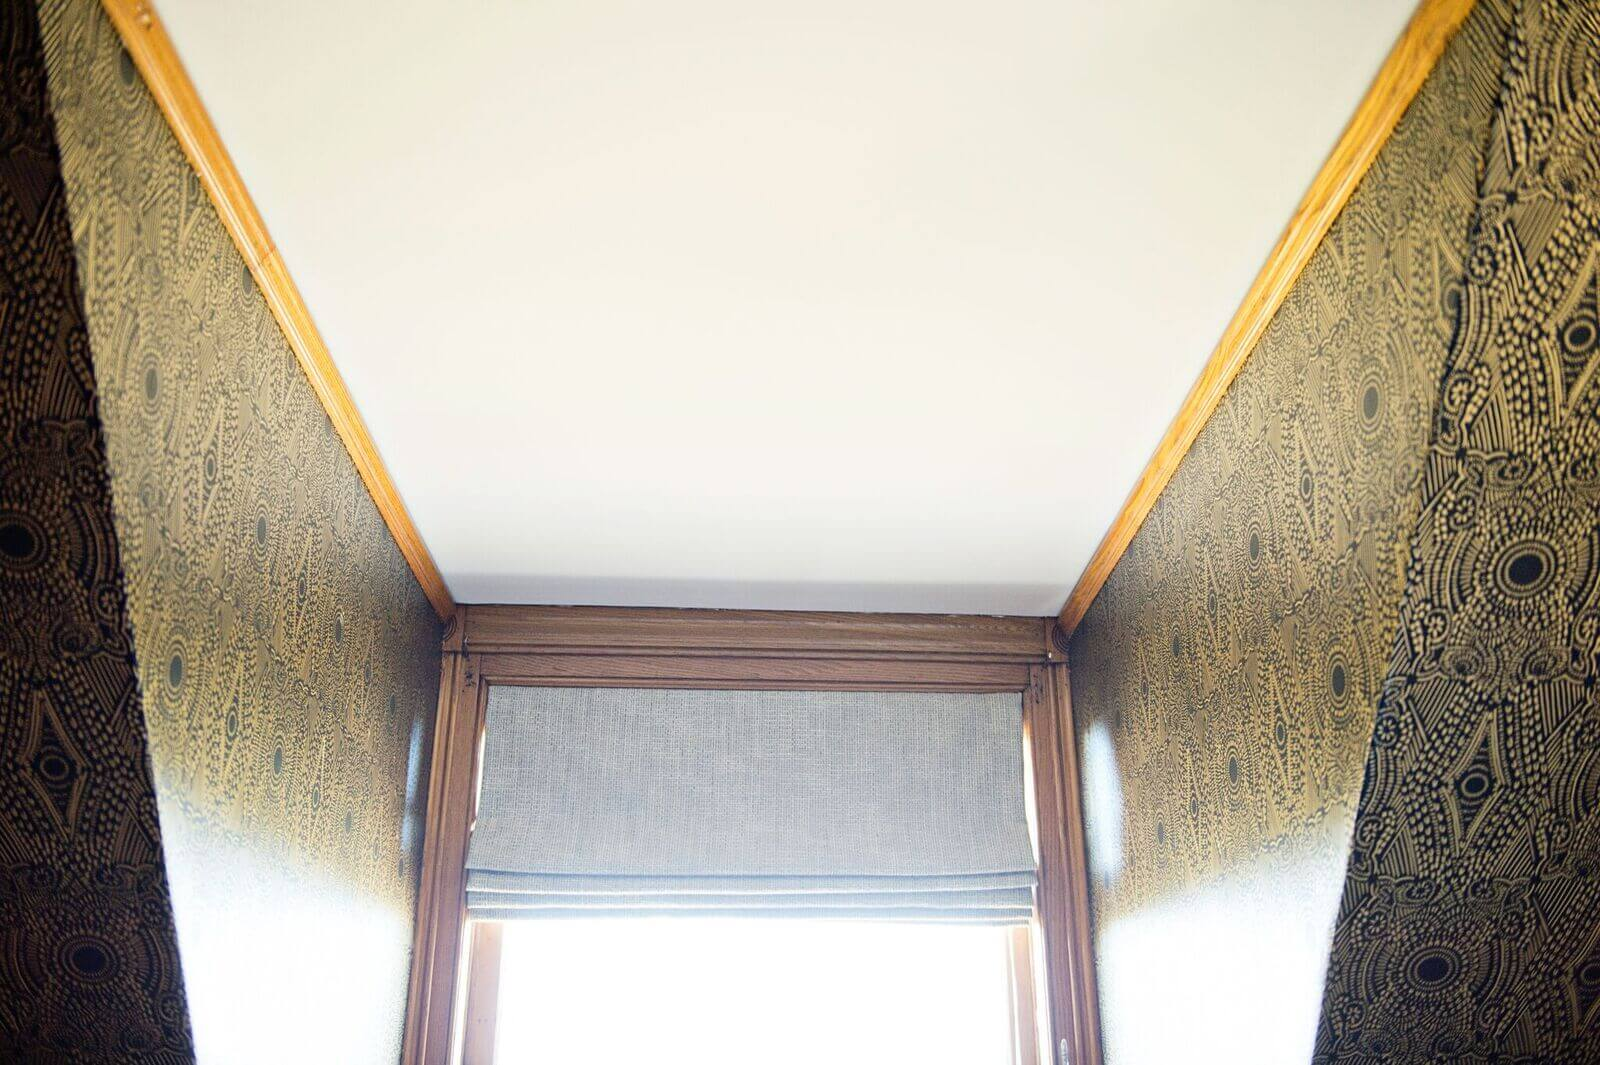 interior-design-bedroom-decor-kids-guest-room-elegant-philadelphia-pa-5.jpeg